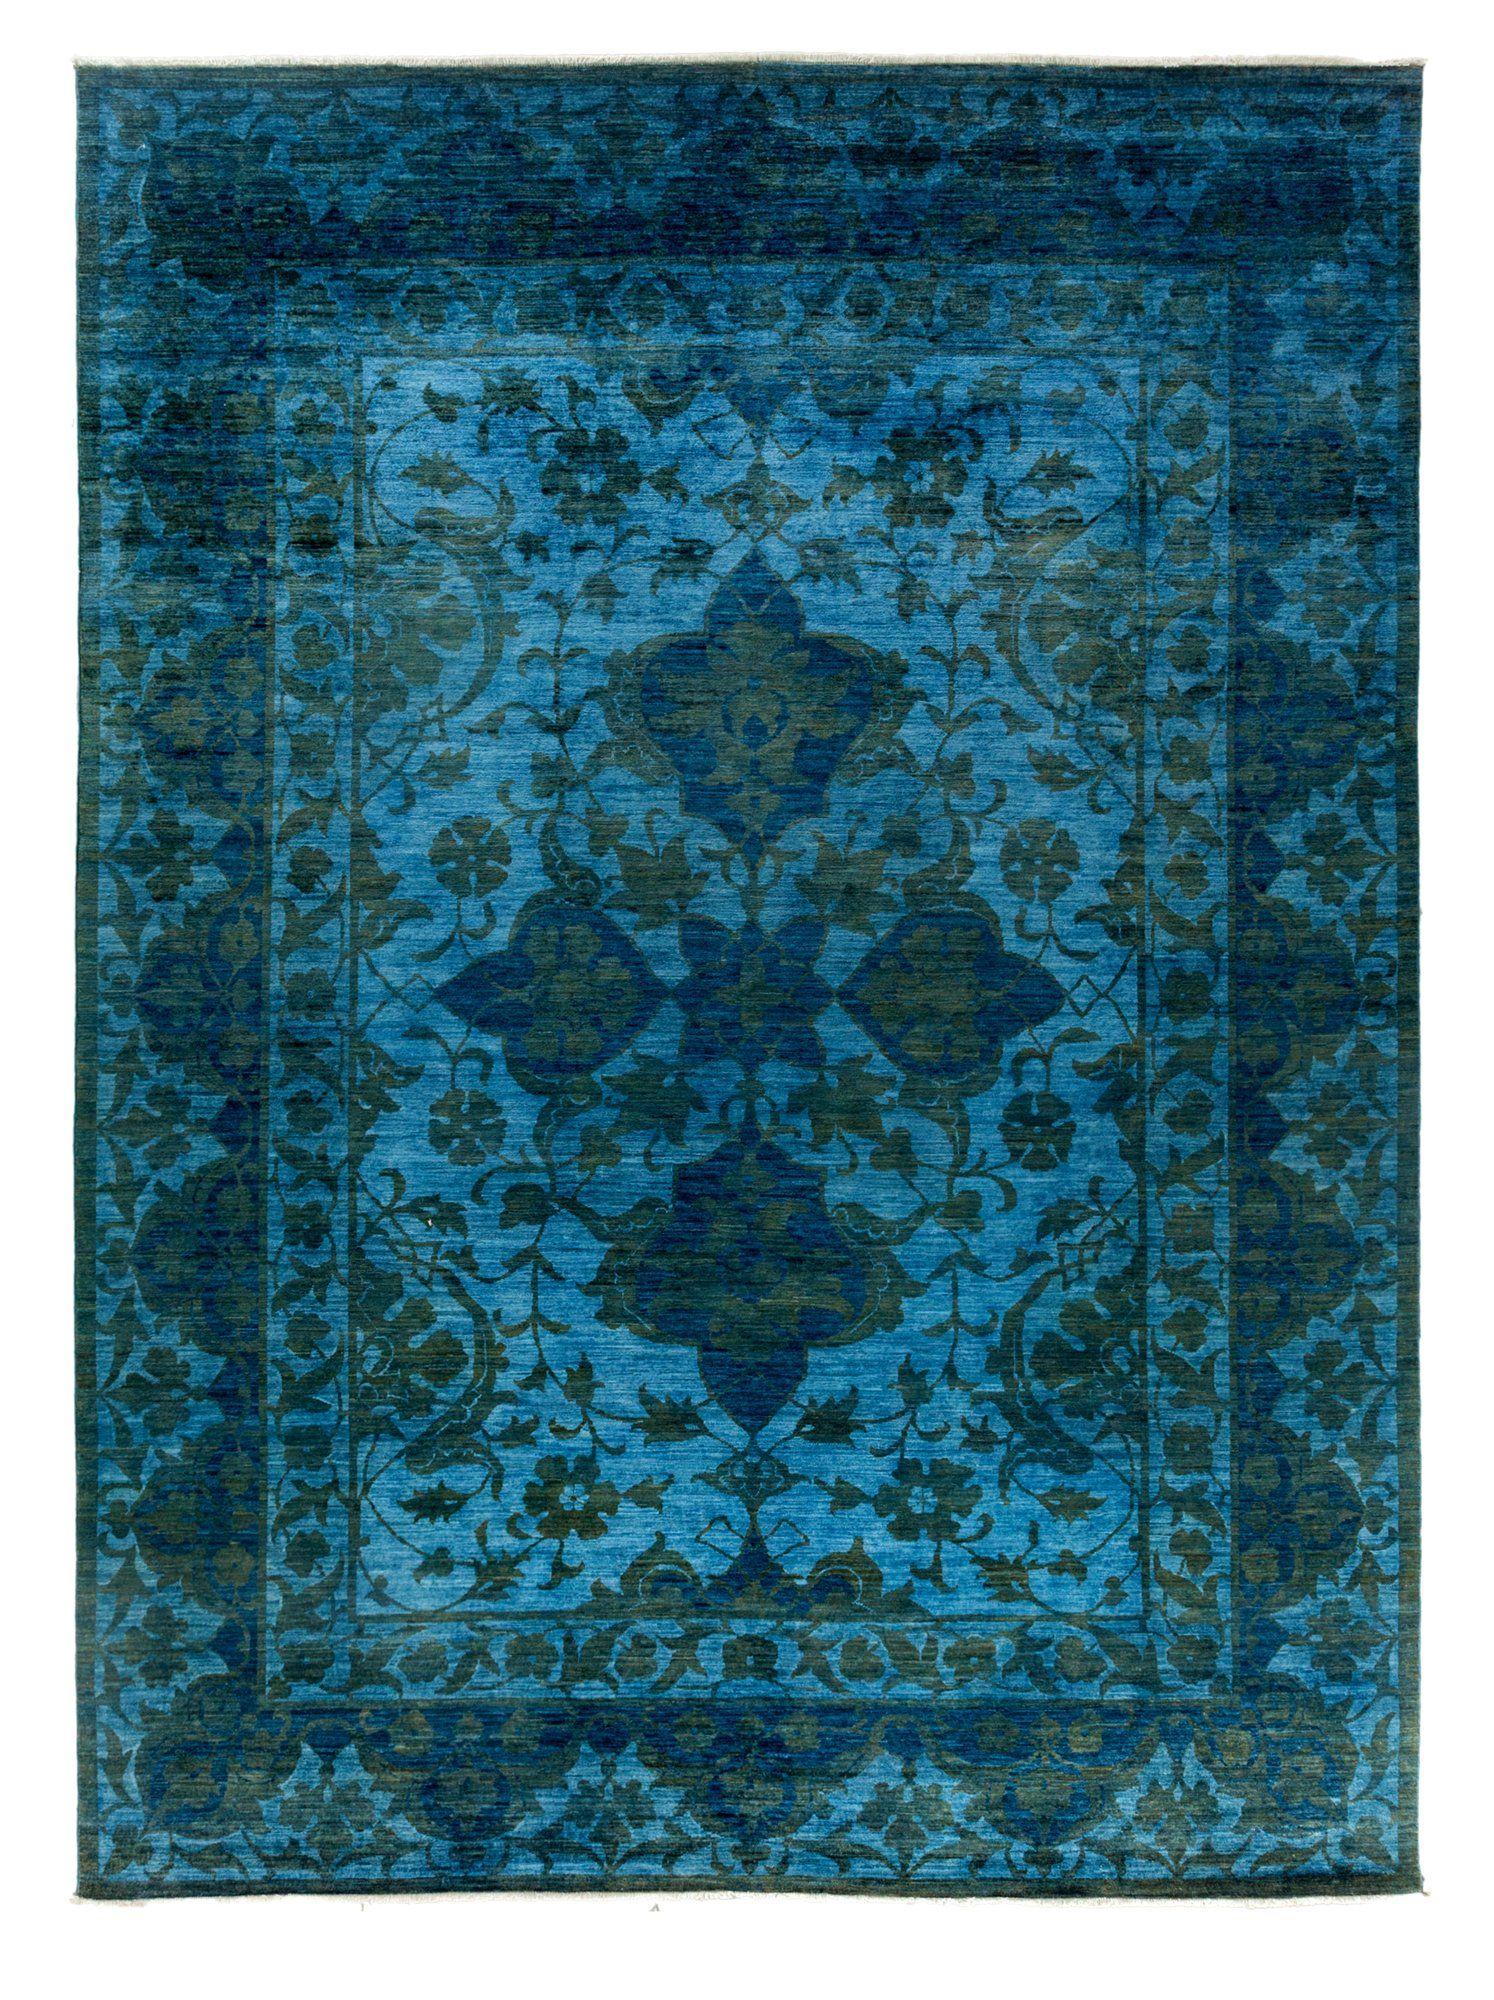 Darya Rugs Ziegler One of a Kind Rug, Blue, 10 x 14 at MYHABIT